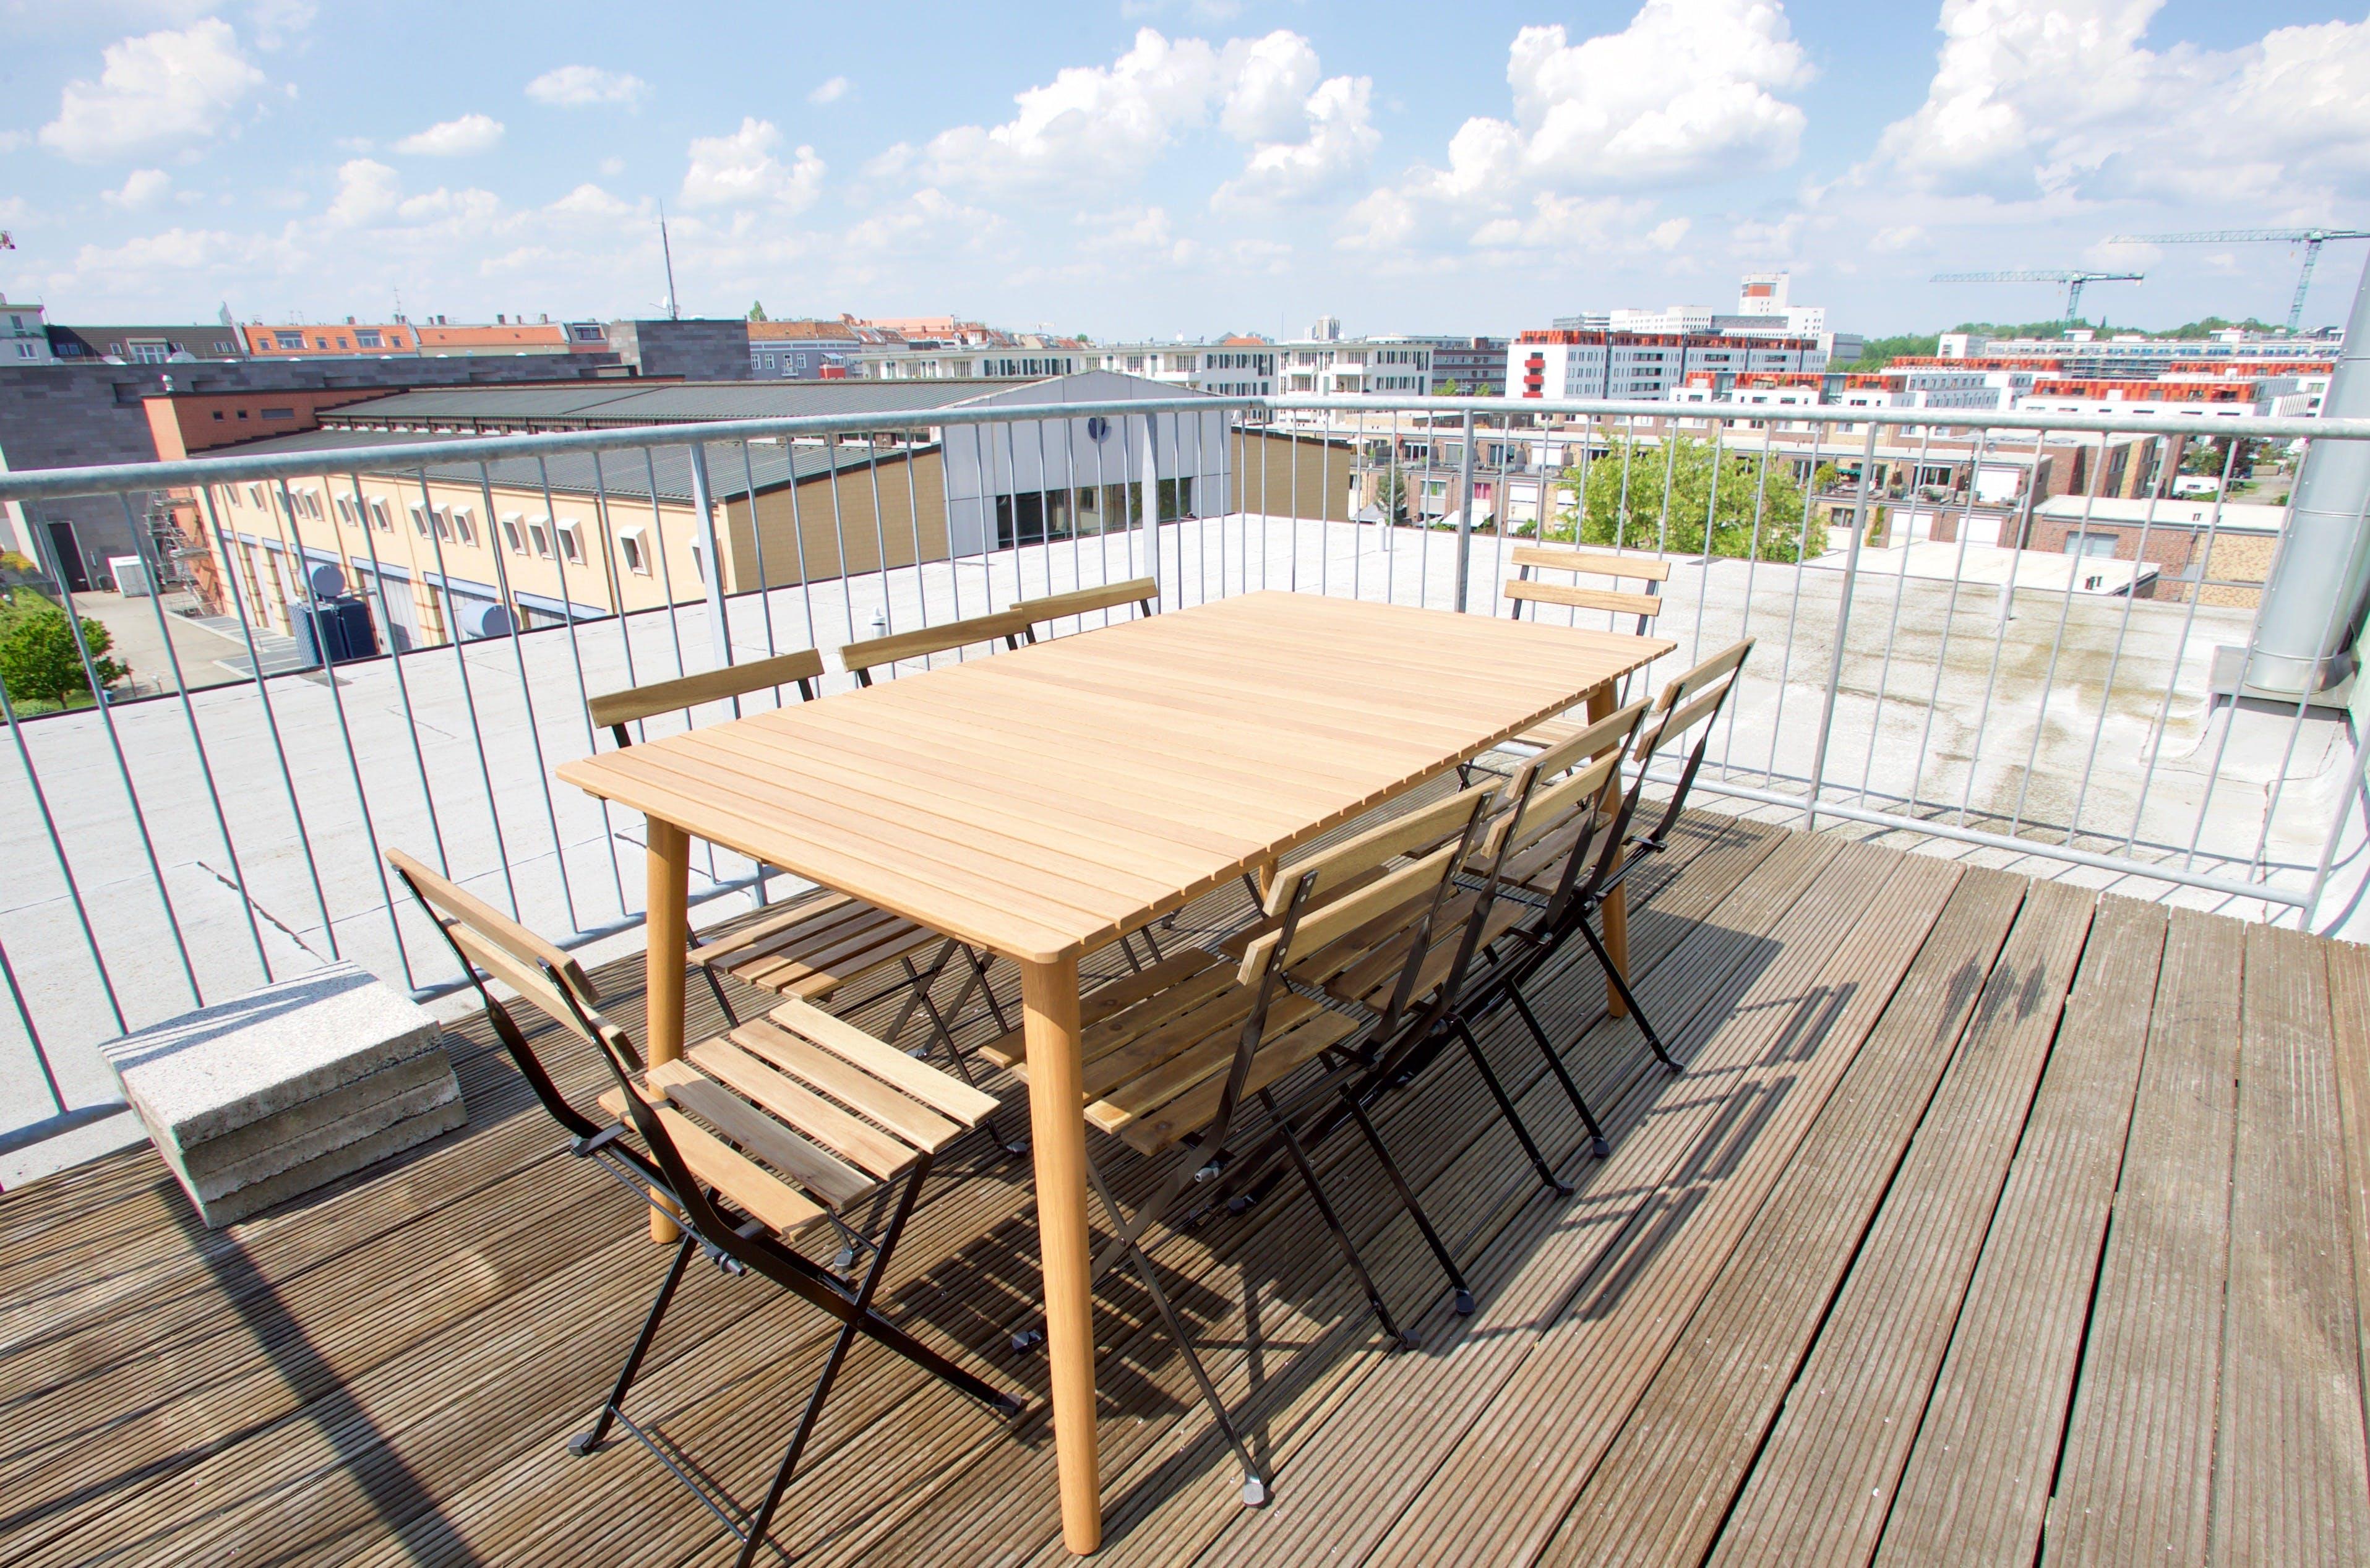 Renovated Urban Apt   - Incl. Workspace + Rooftop Deck